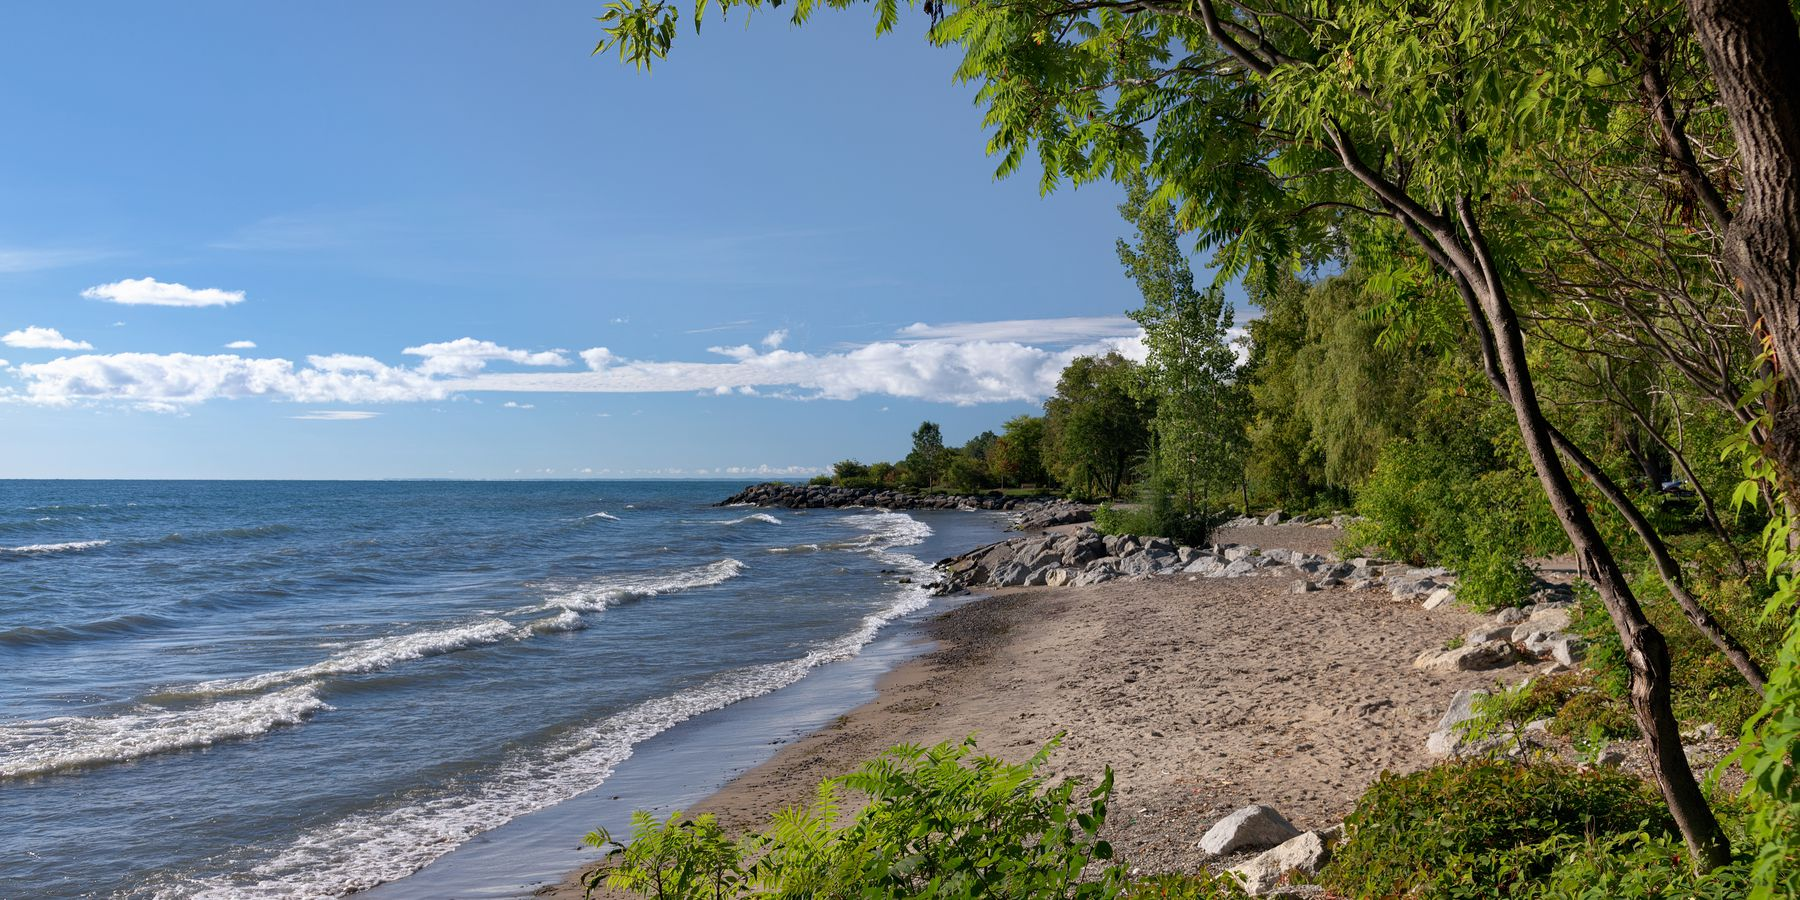 Natuur Ontario - Canada - Doets Reizen